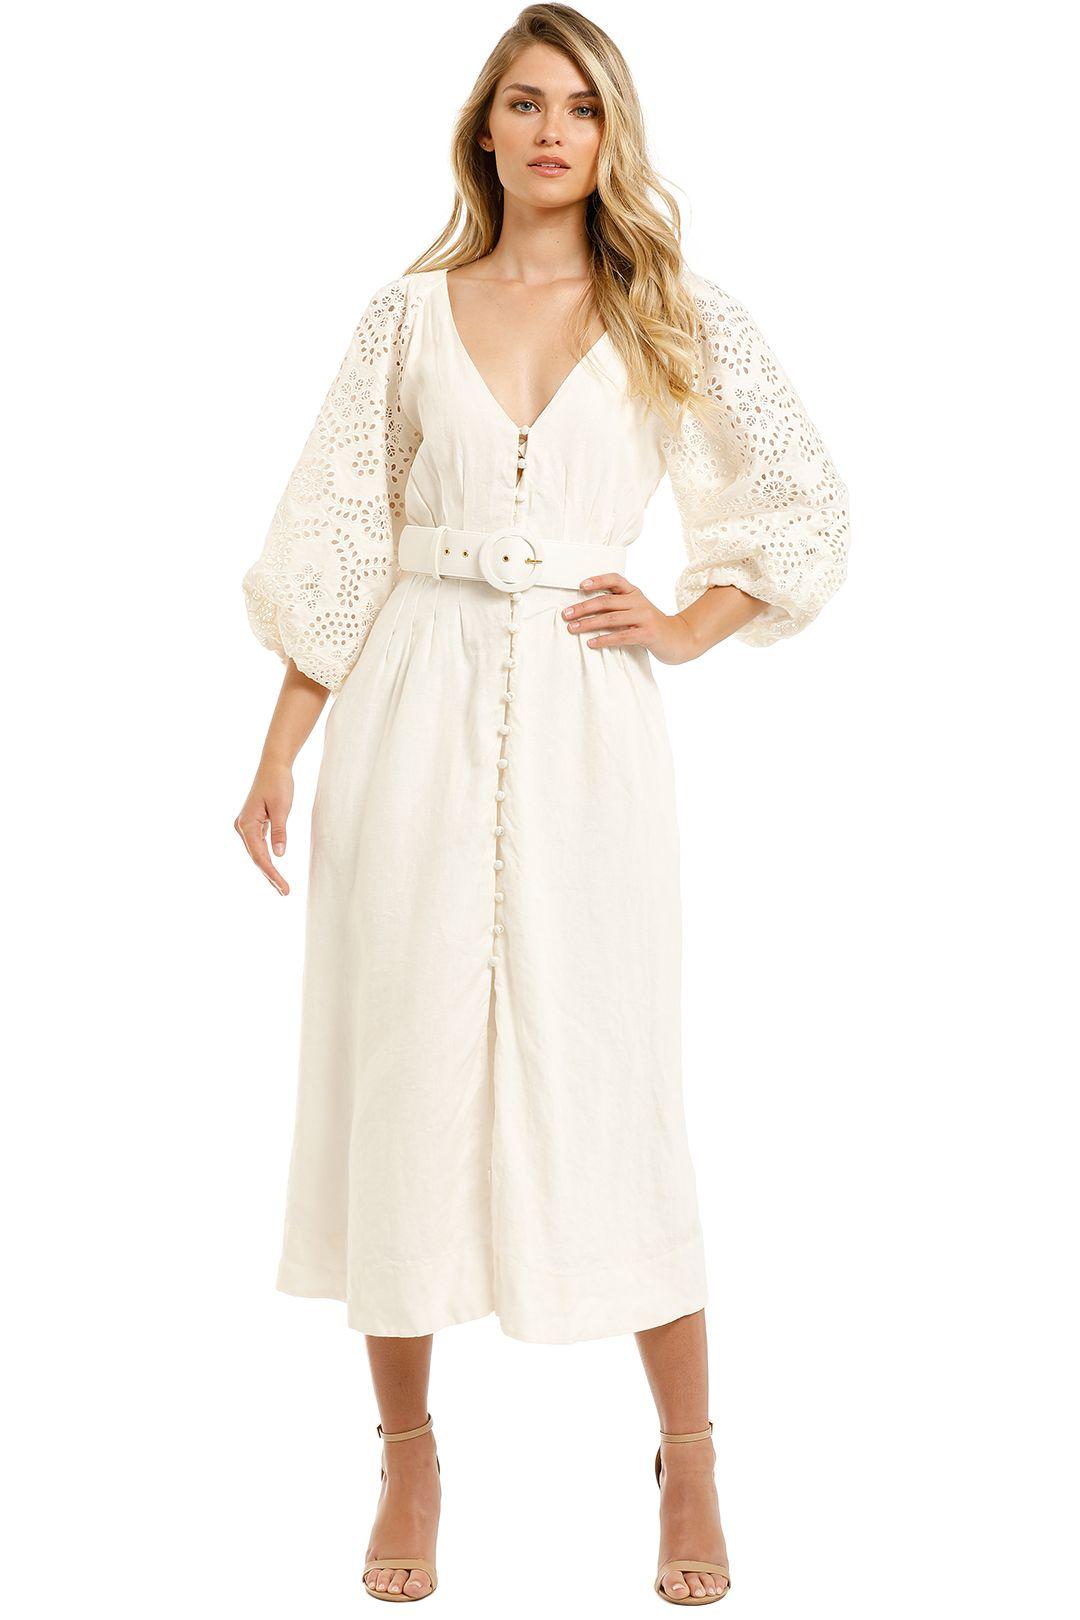 Nicholas-Hasina-Dress-Ivory-Front